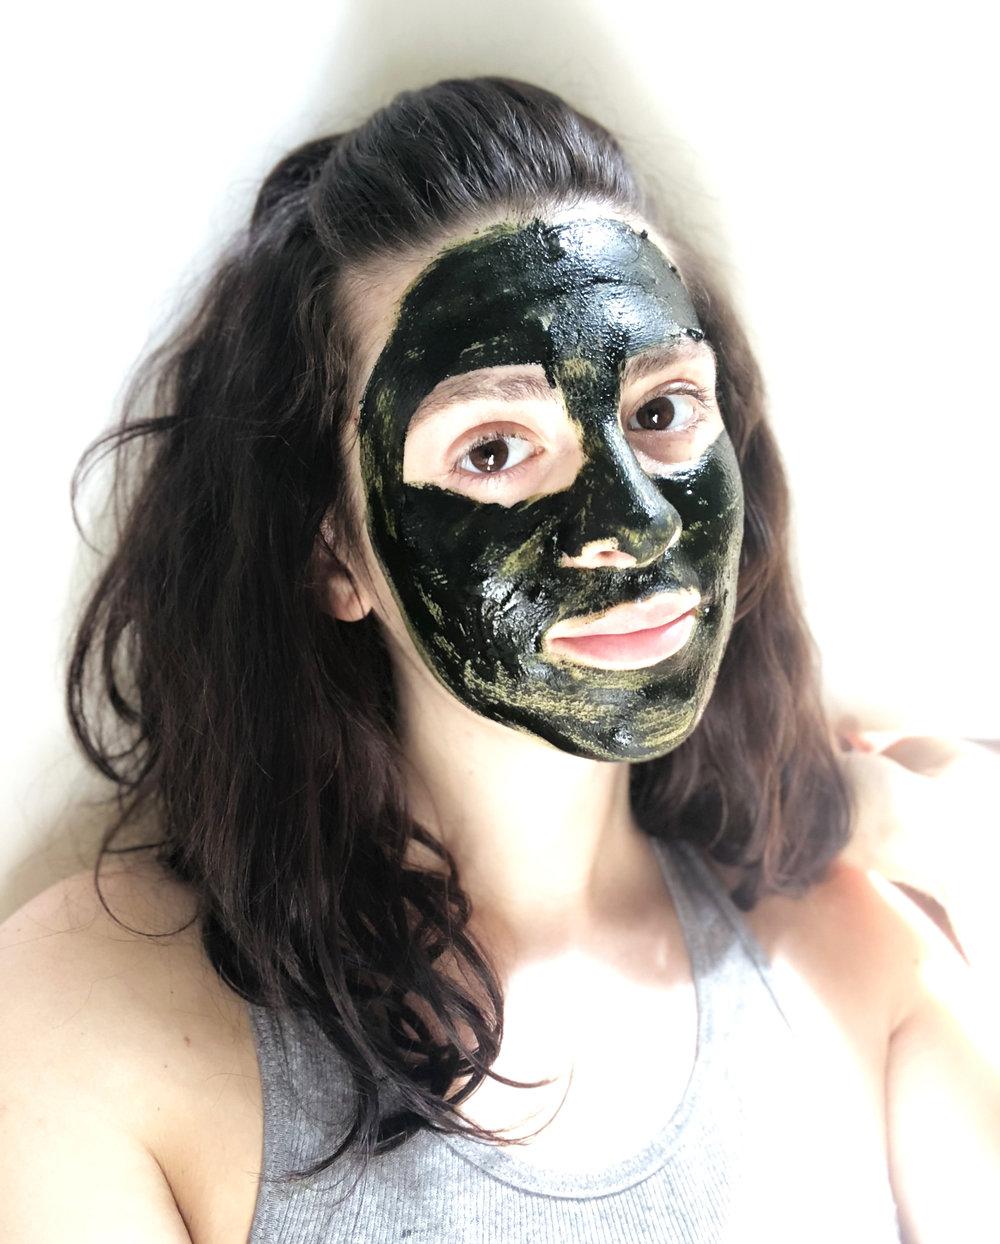 chlorella-face-mask-diy-anti-acne-mask.jpg